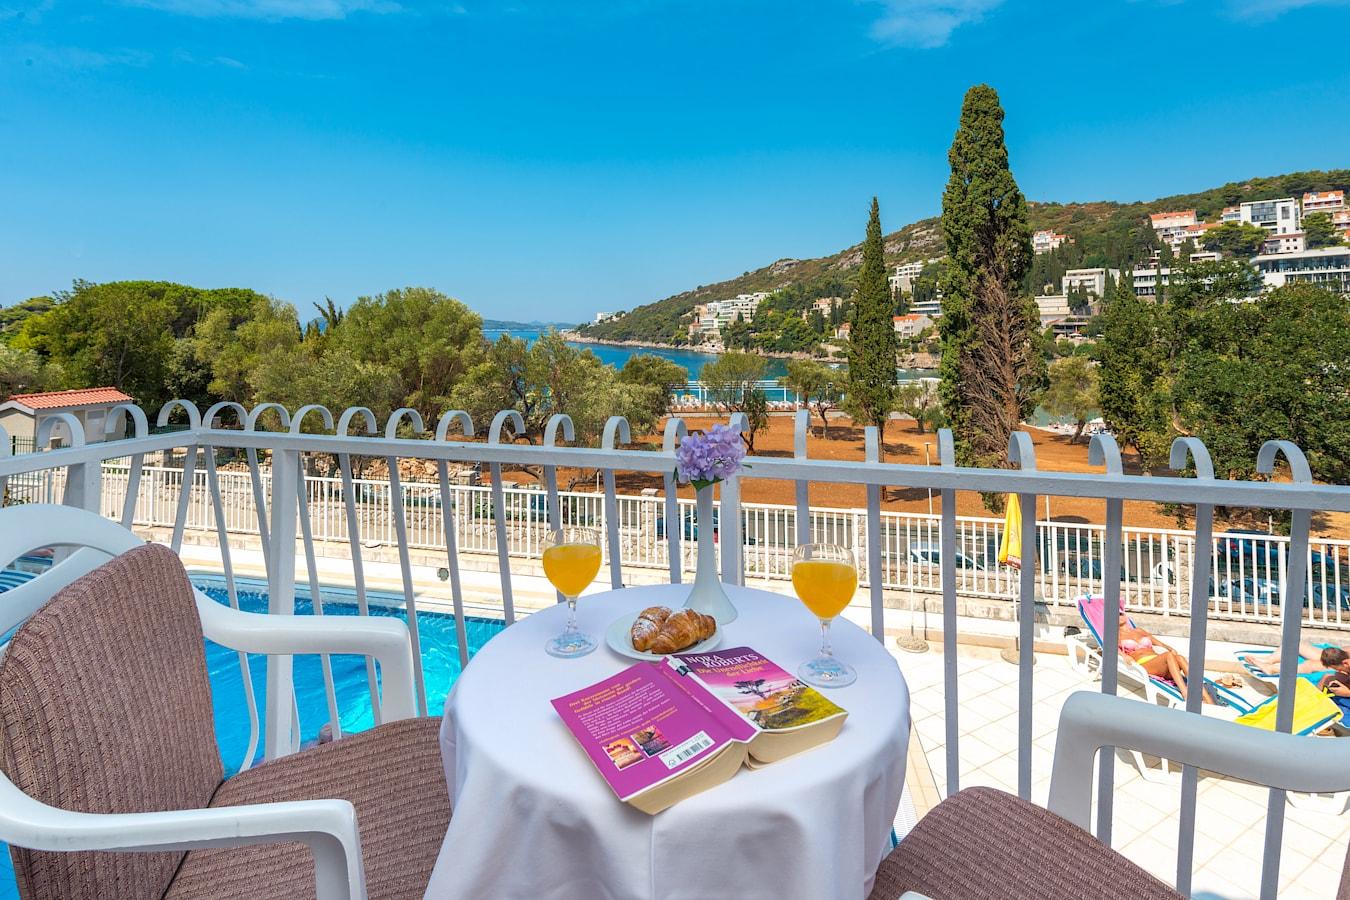 komodor-hotel-rooms-balcony-seaview-poolview.jpg